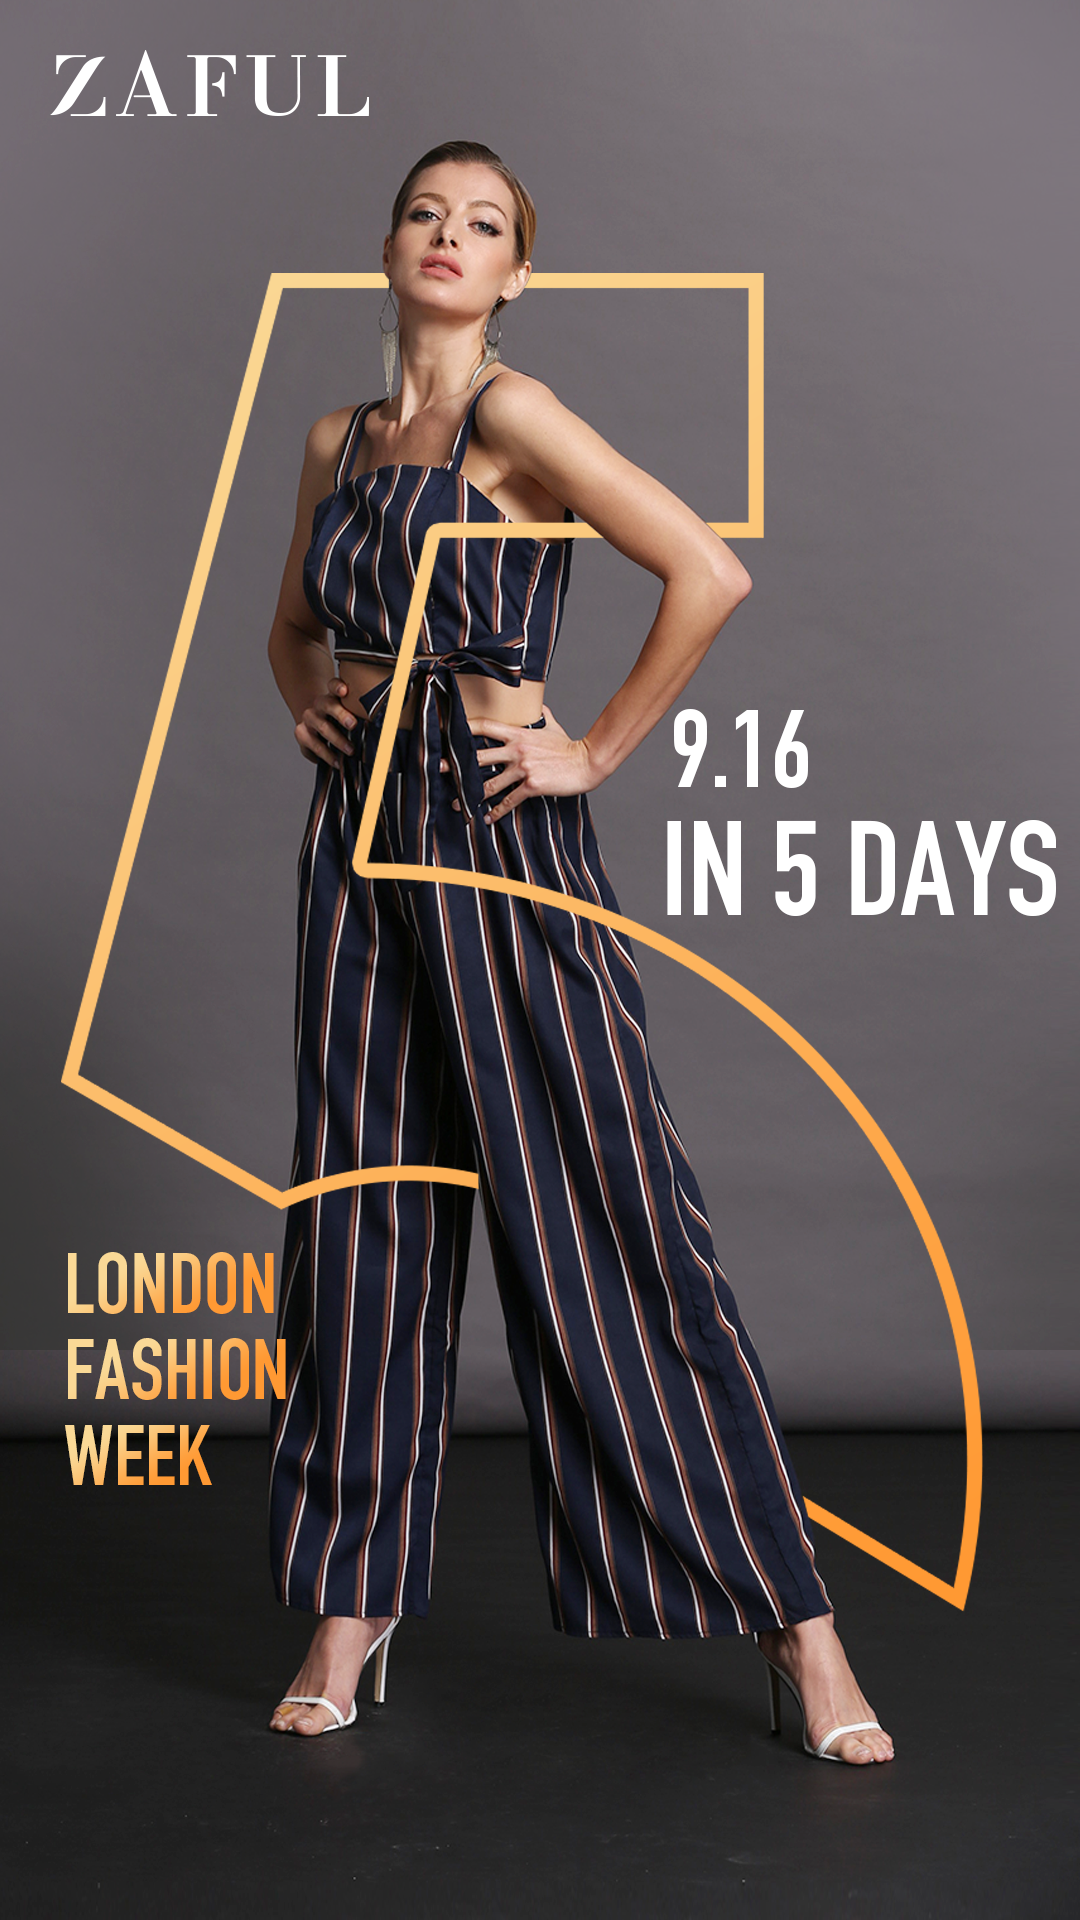 ZAFUL | London Fashion Week | 2018.09.16 This September ...